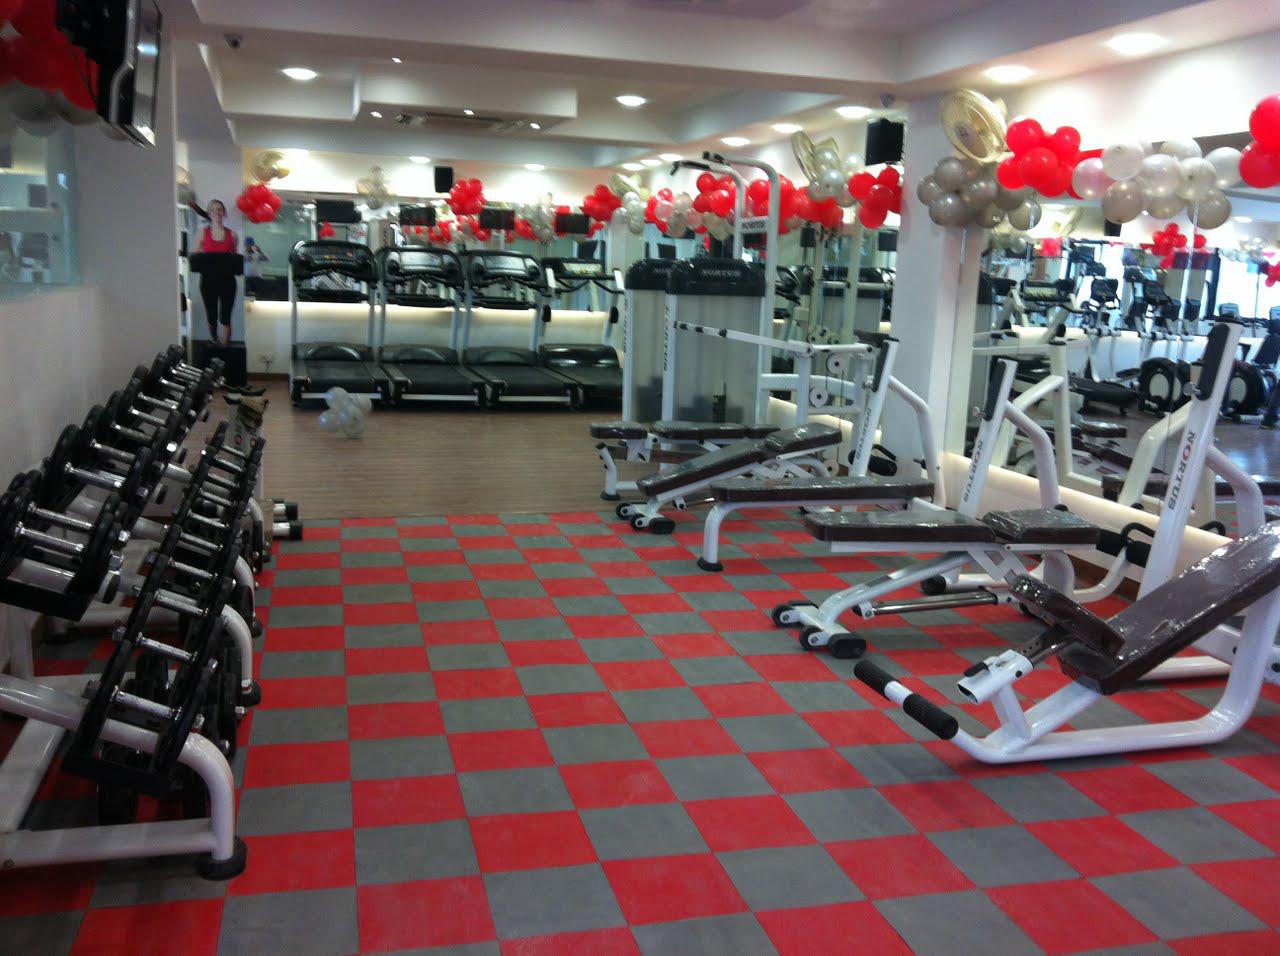 Rubber floor mats for garage gym - Uniflor Sports Flooring Rubber Vinyl